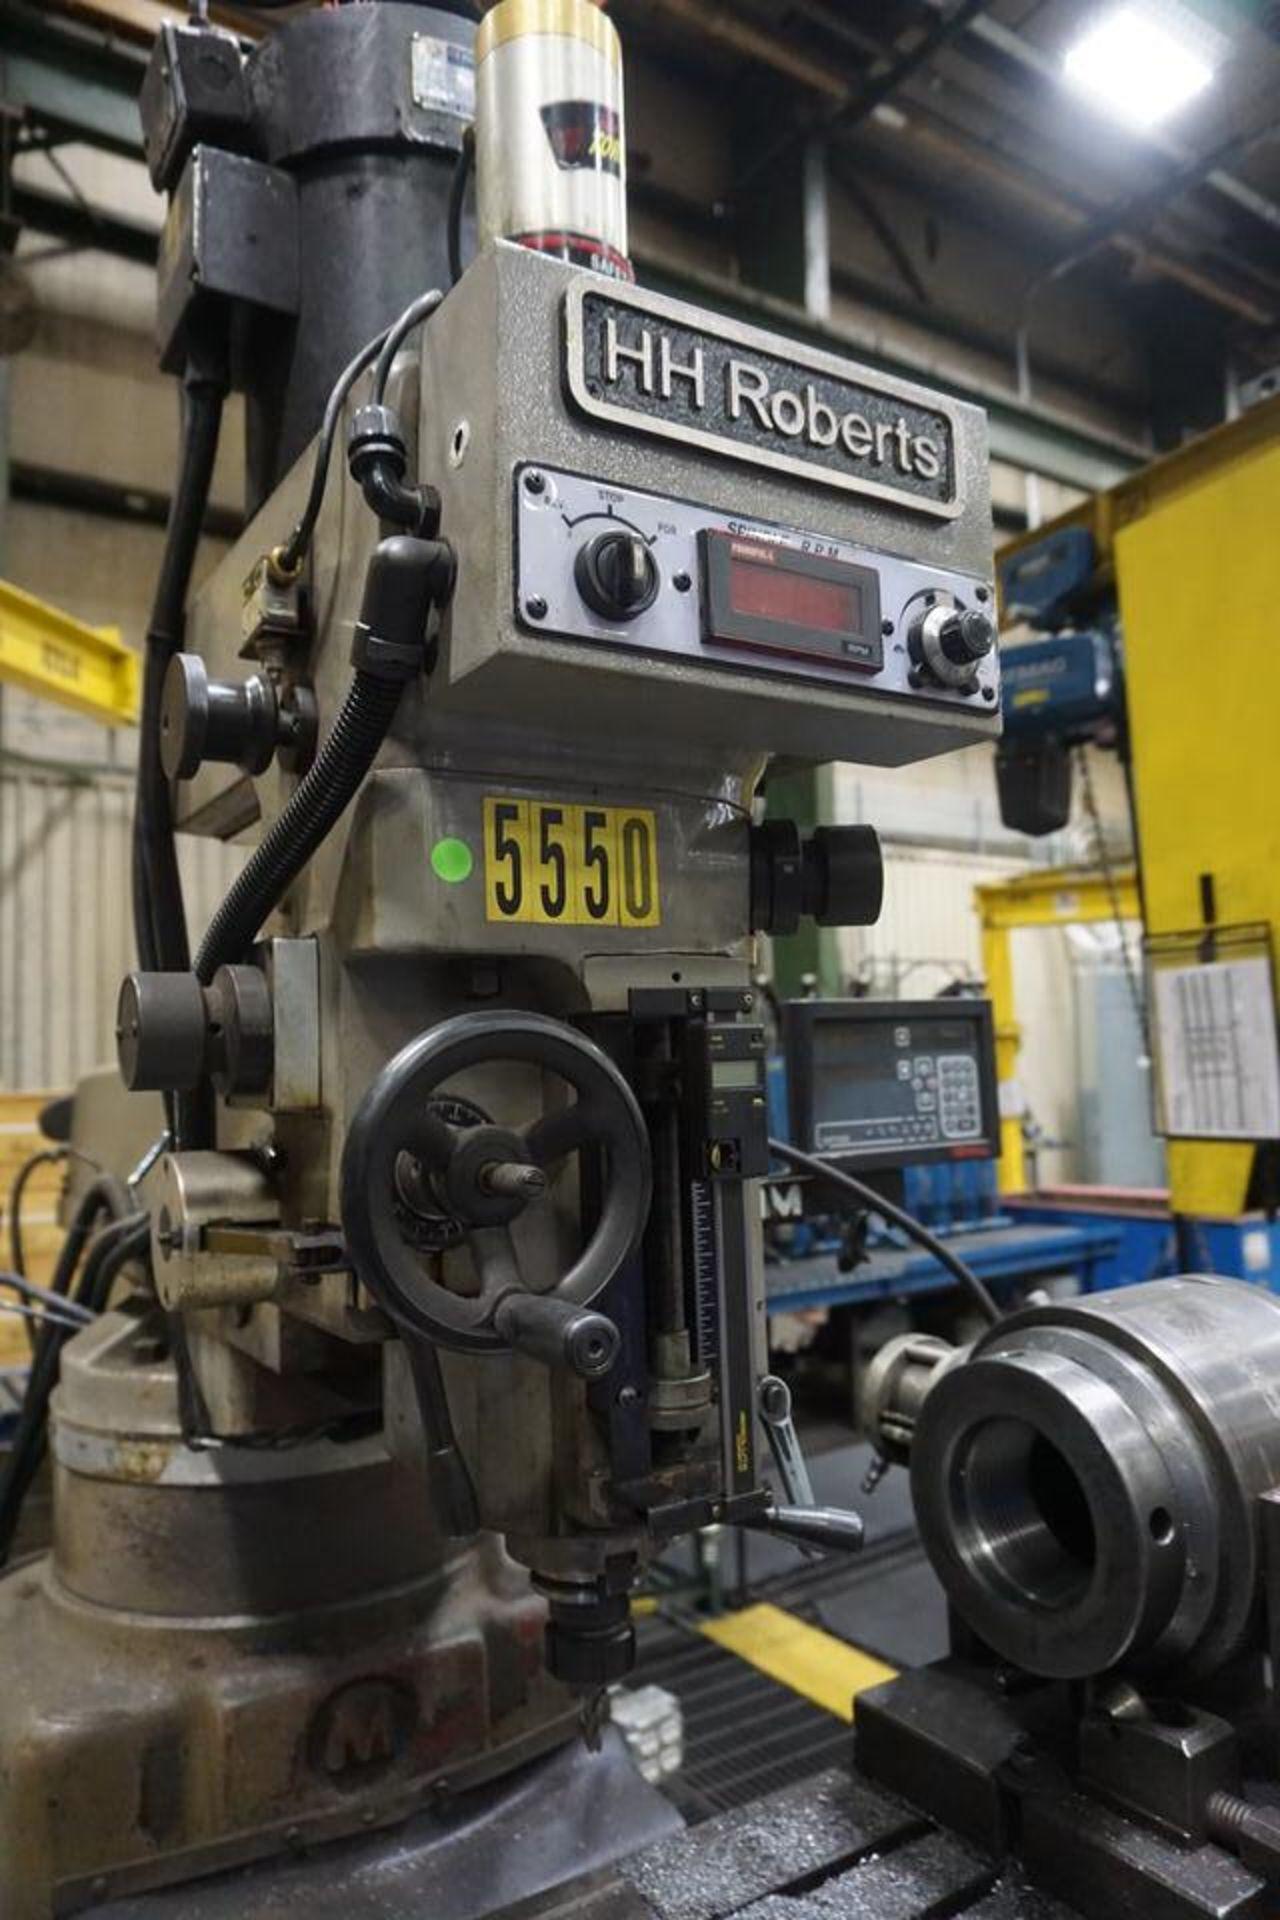 HH ROBERTS VERTICAL MANUAL MILLING MACHINE (ASST#: p849203) - Image 3 of 3